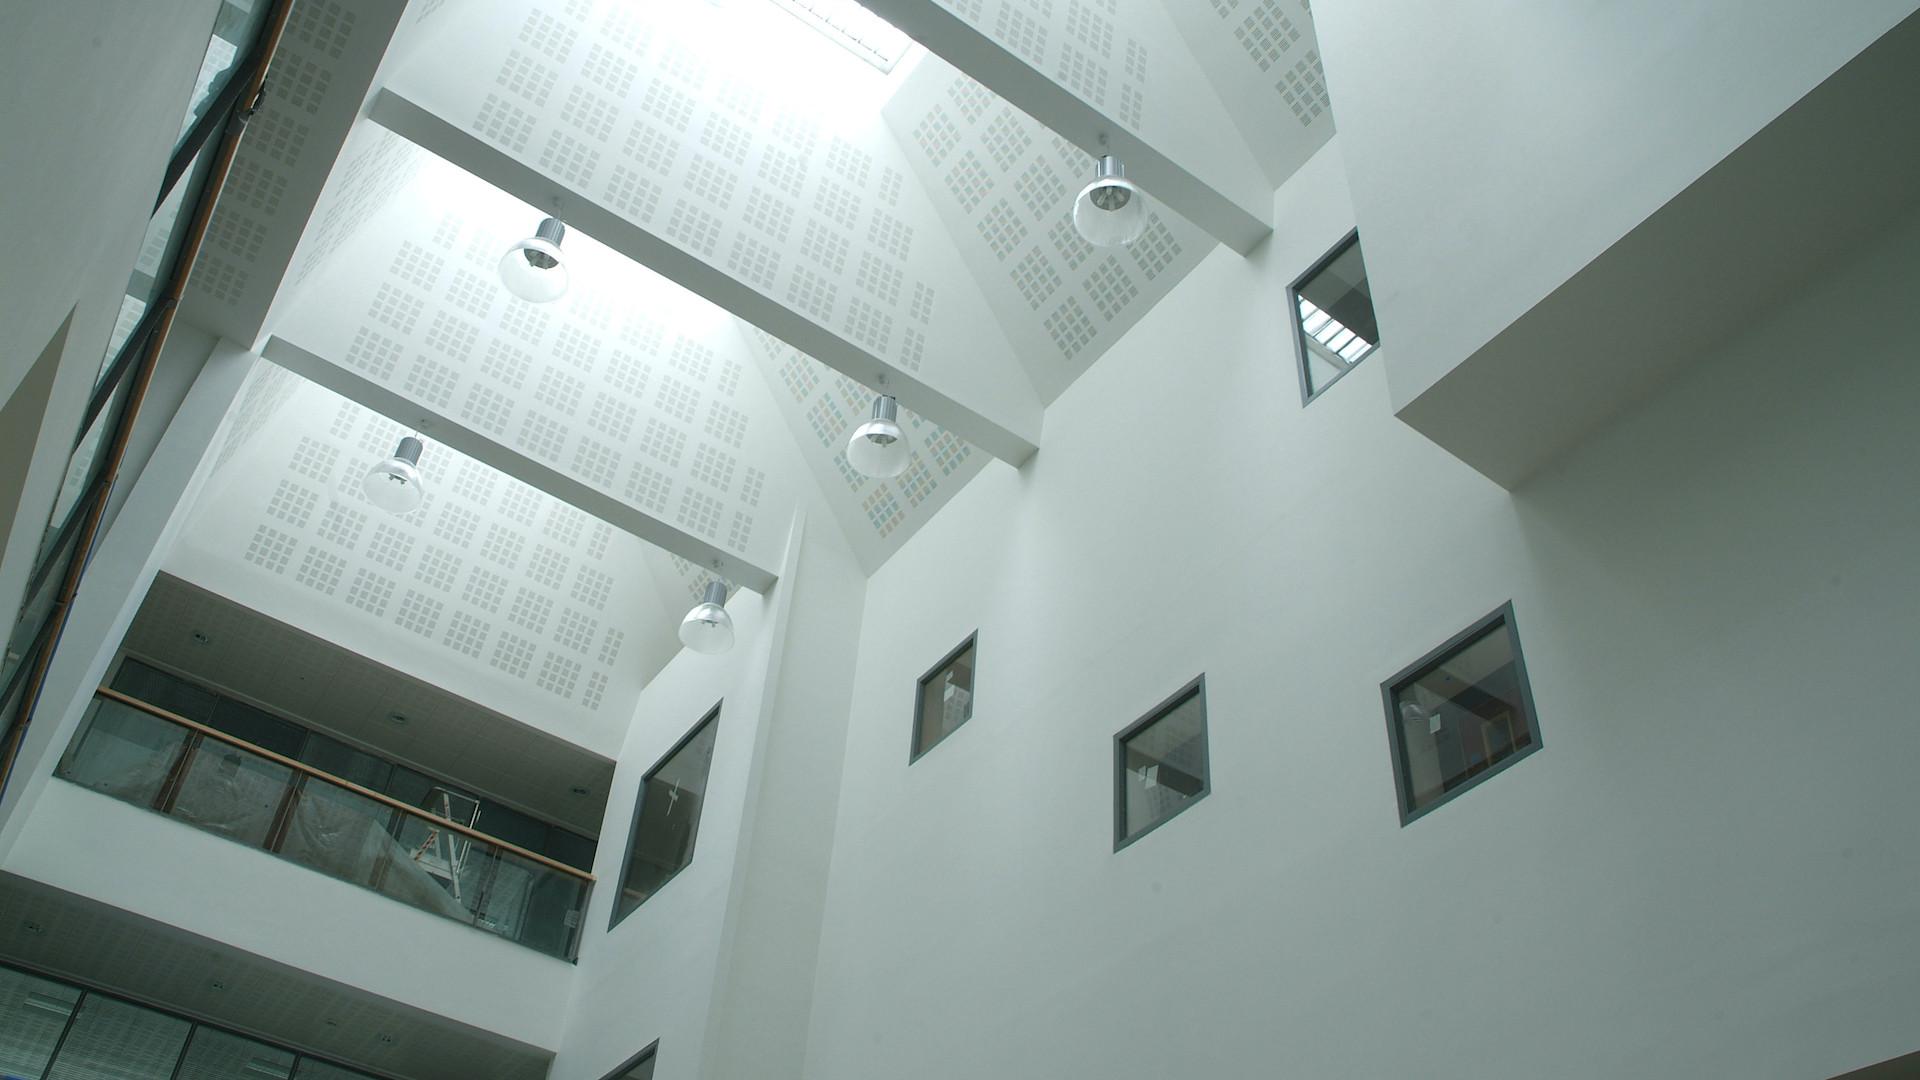 Bolton Sixthform College